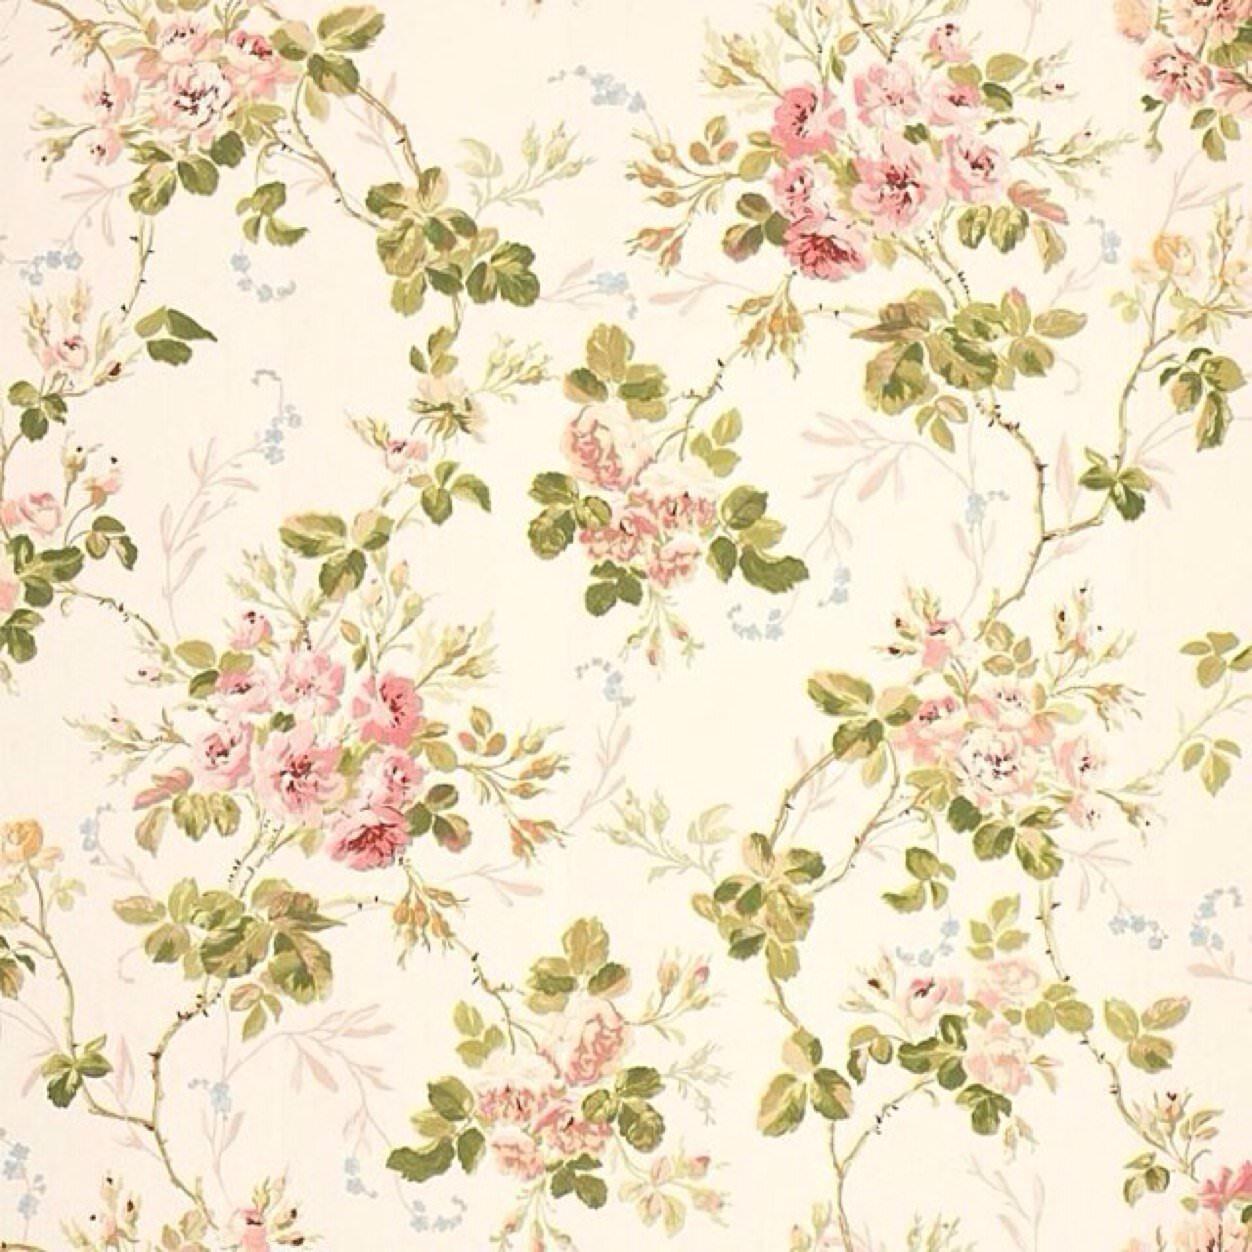 Download 15 free floral vintage wallpapers for Floral wallpaper for home